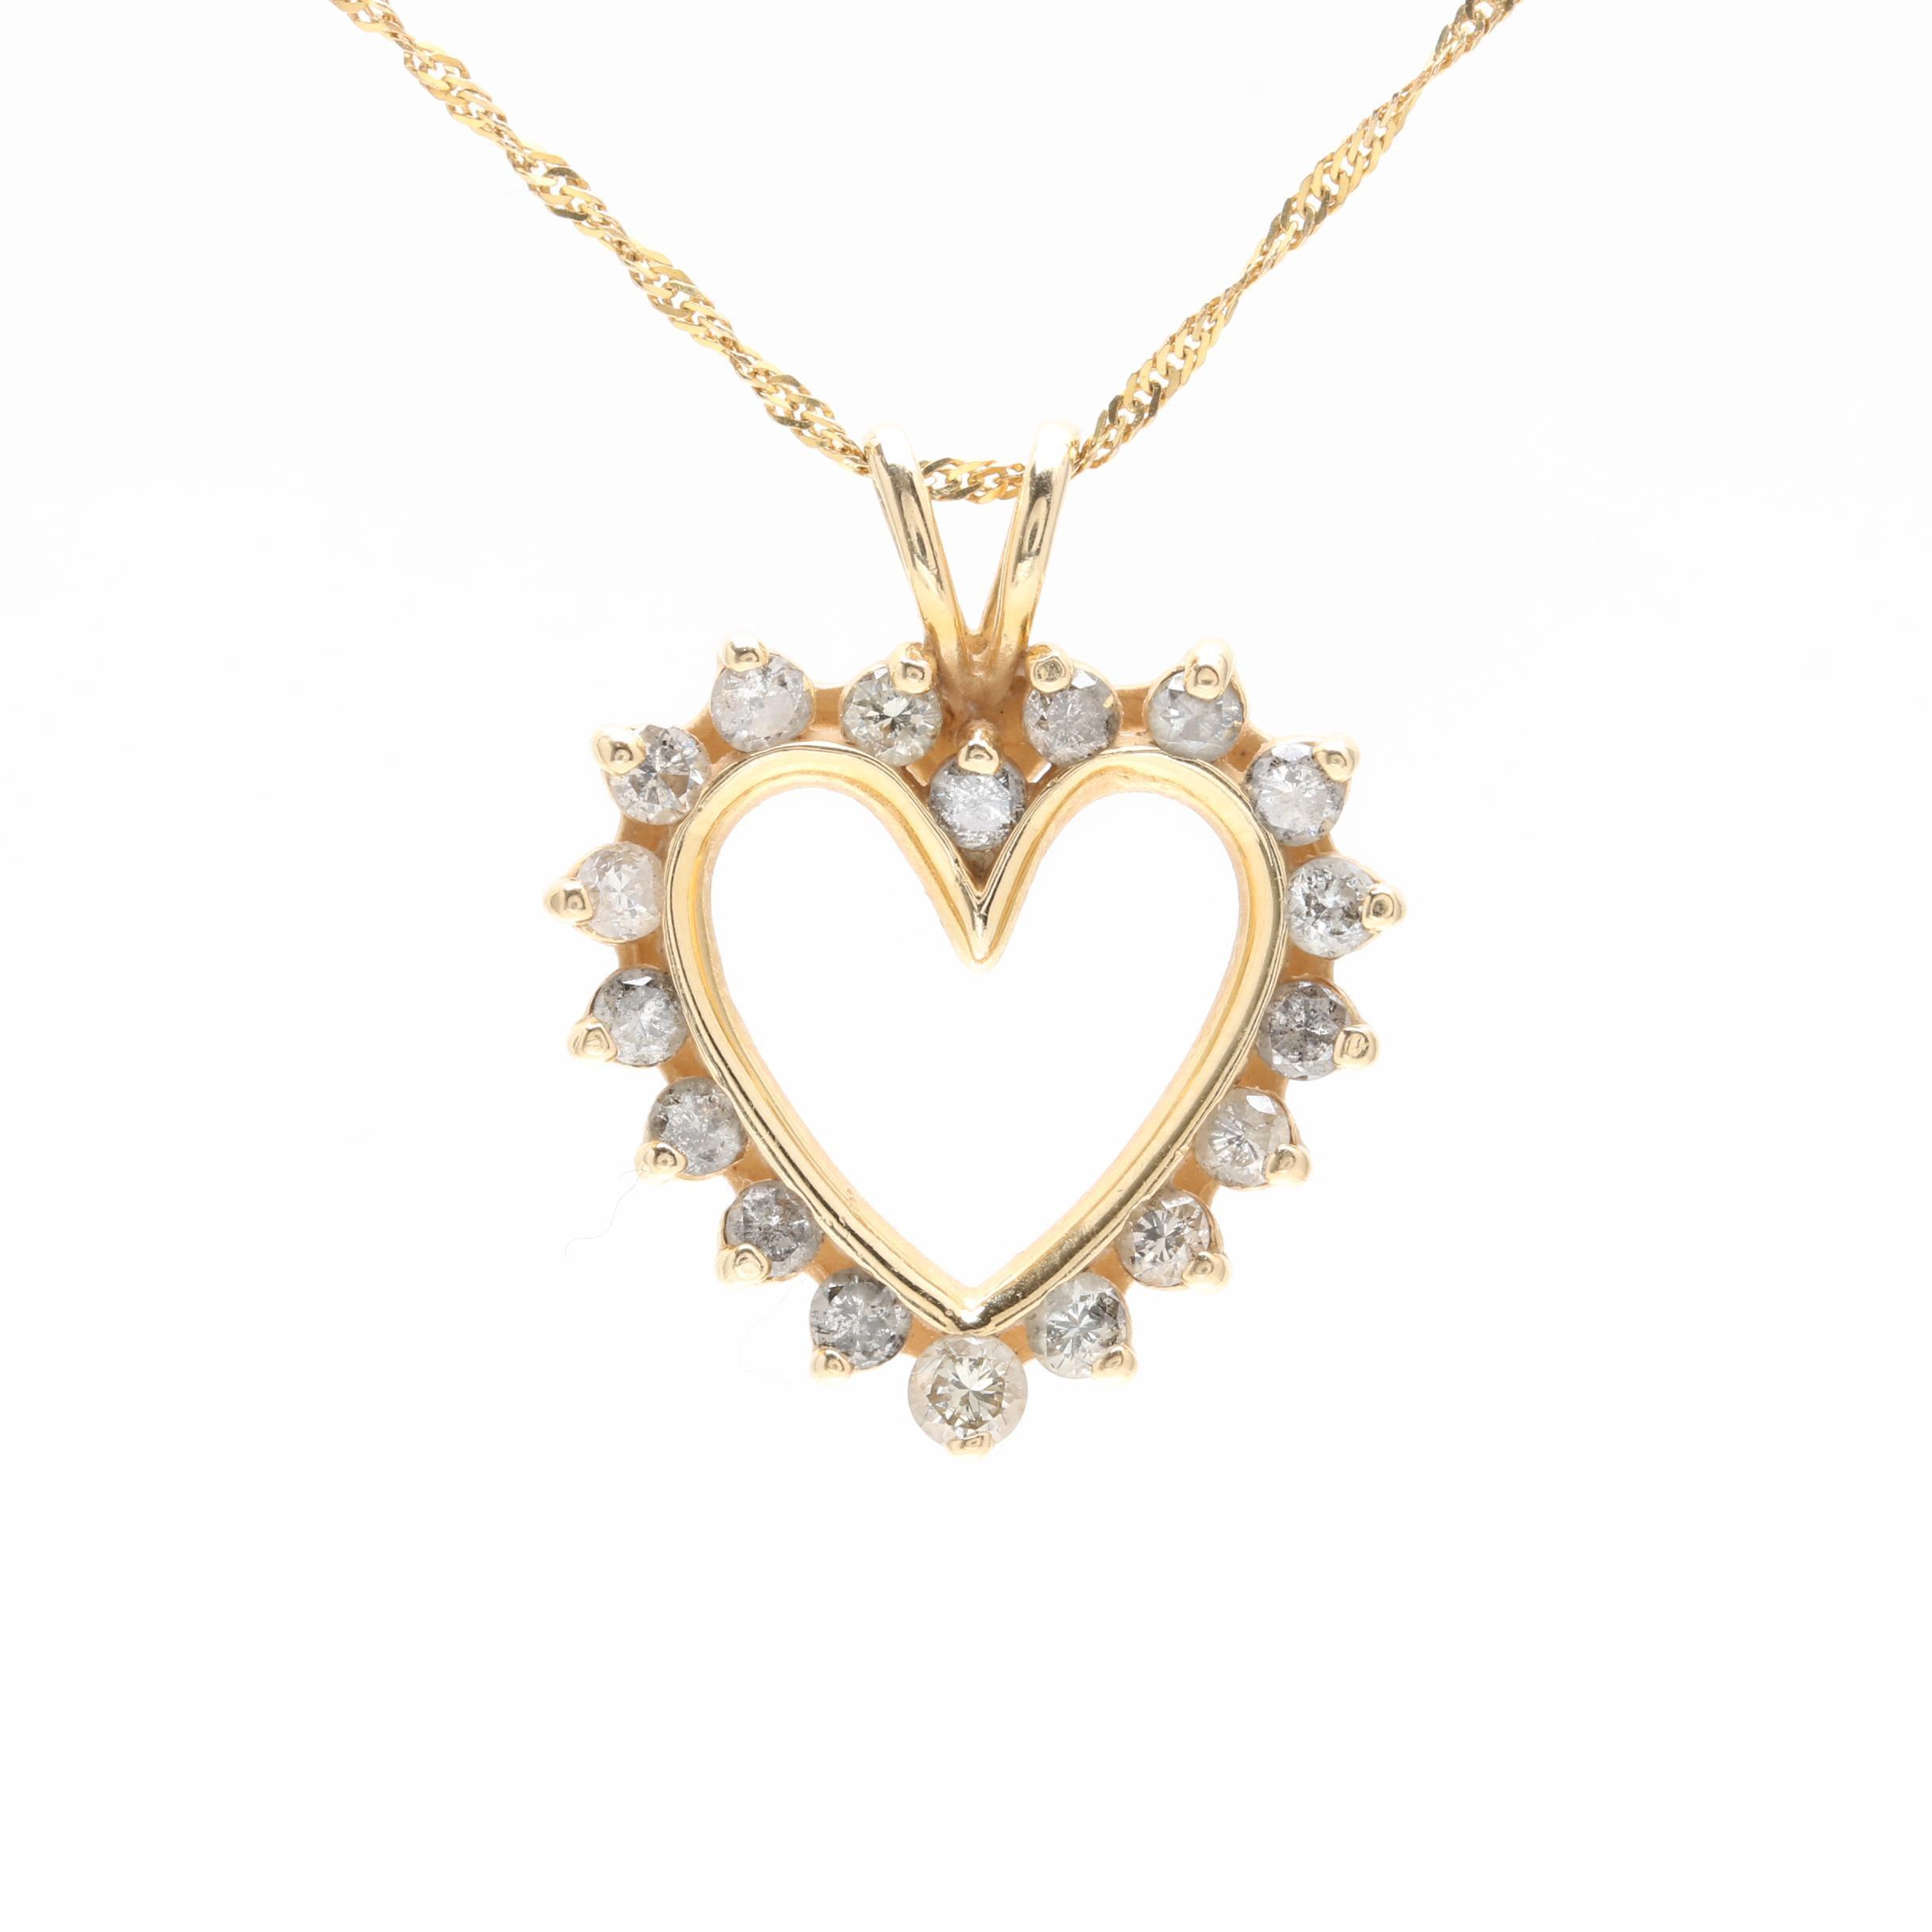 14K Yellow Gold 1.11 CTW Diamond Pendant Necklace